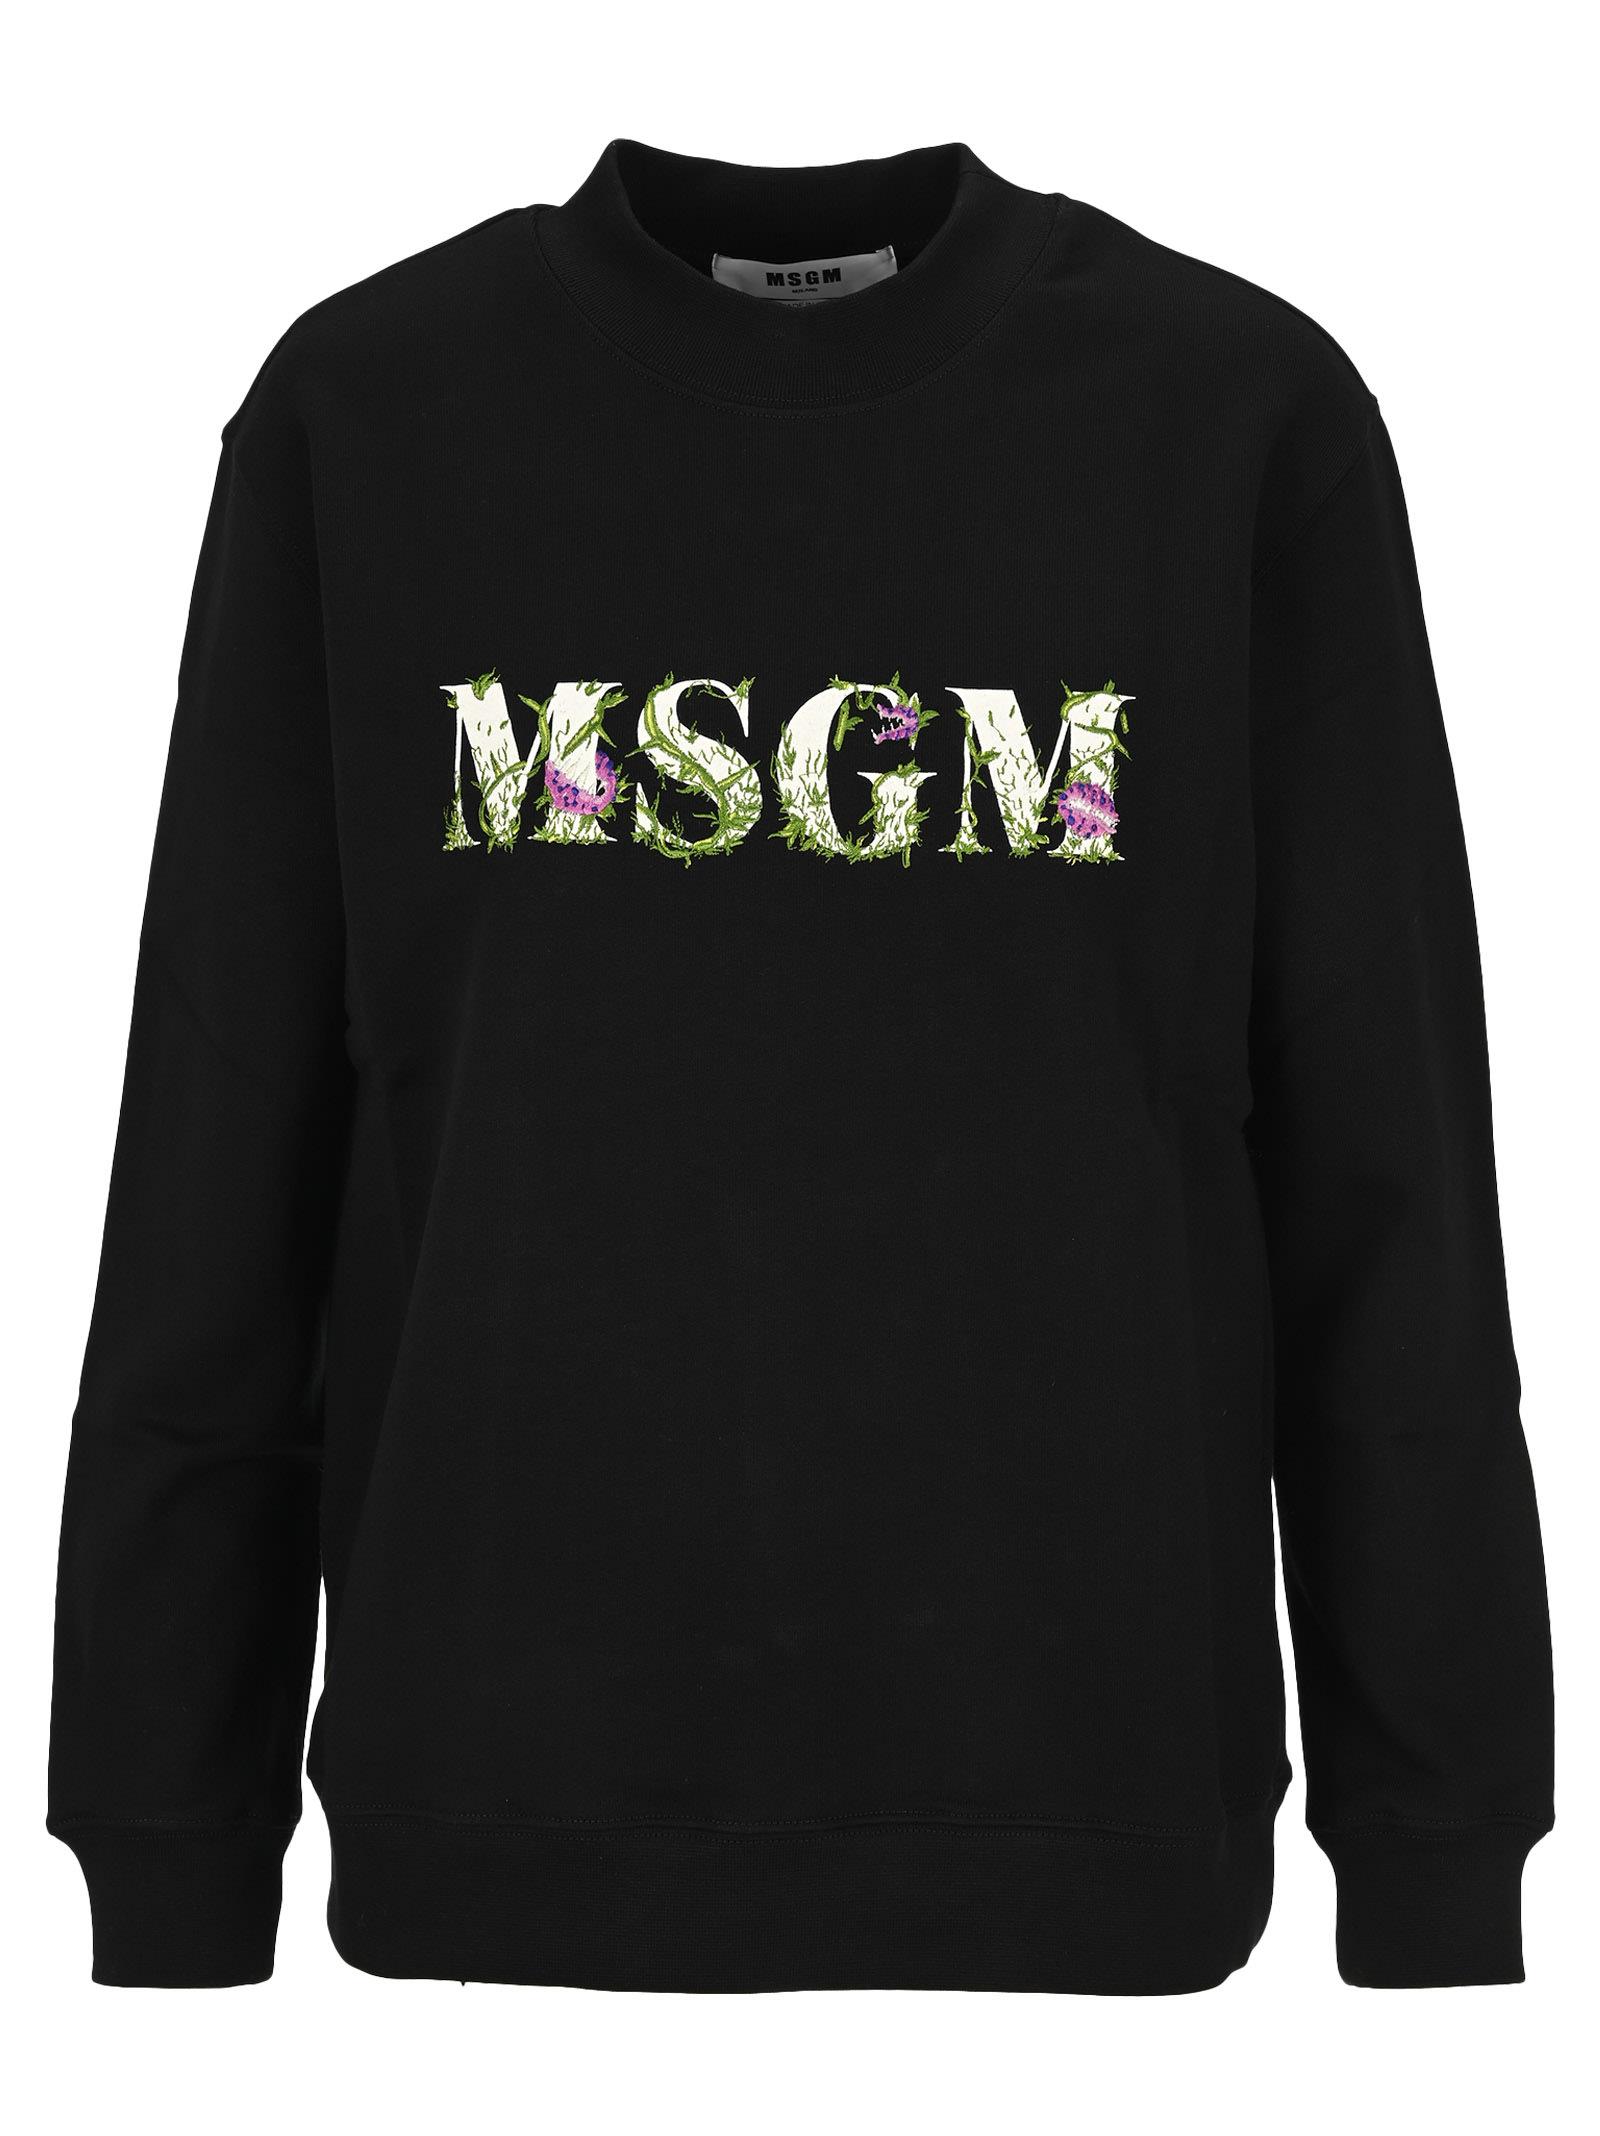 Msgm Floral Logo Sweatshirt